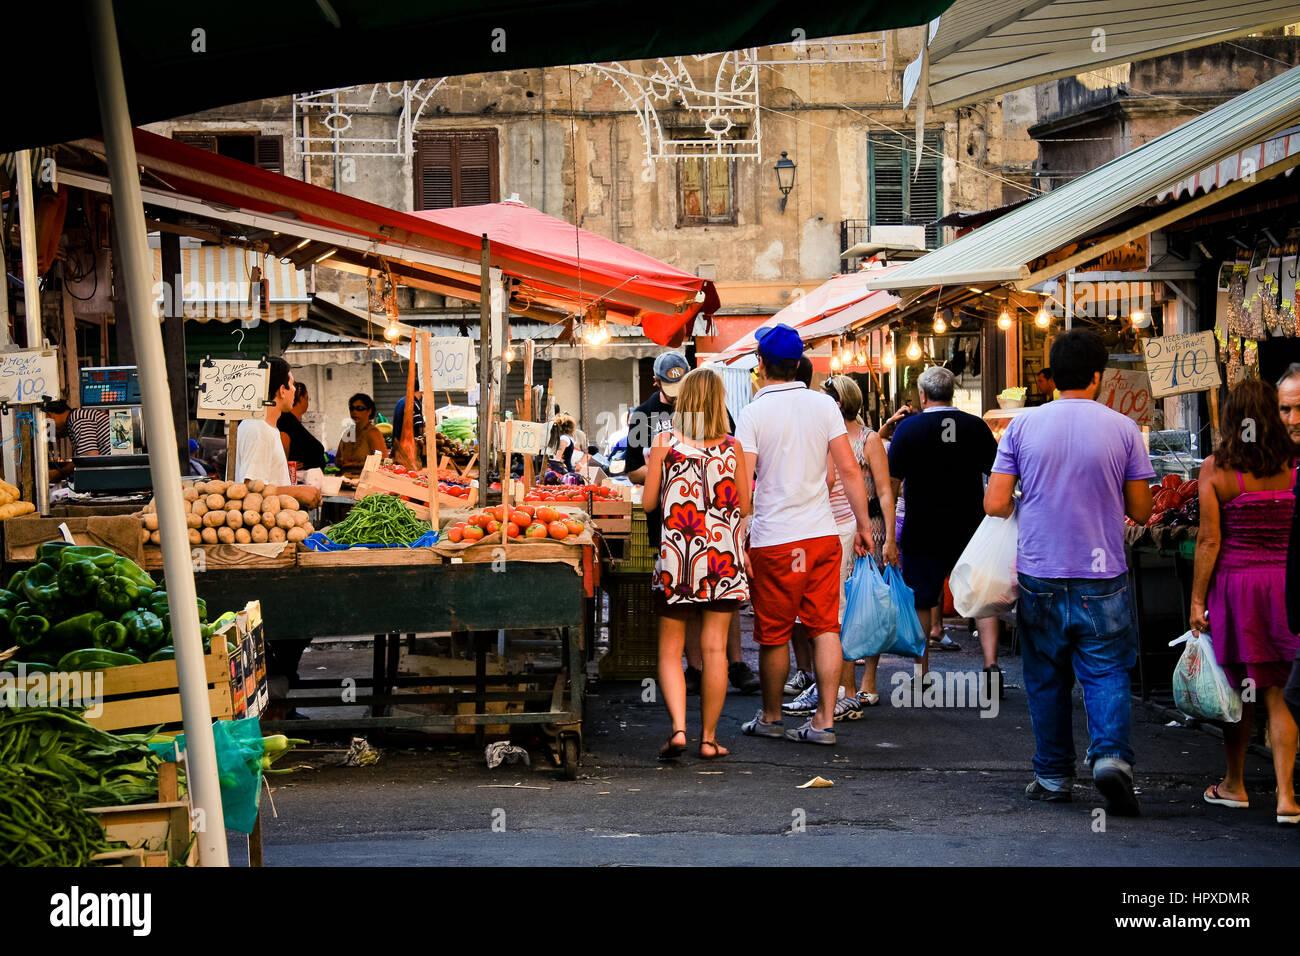 L'Italie, Palerme, Ballar fruit market Photo Stock